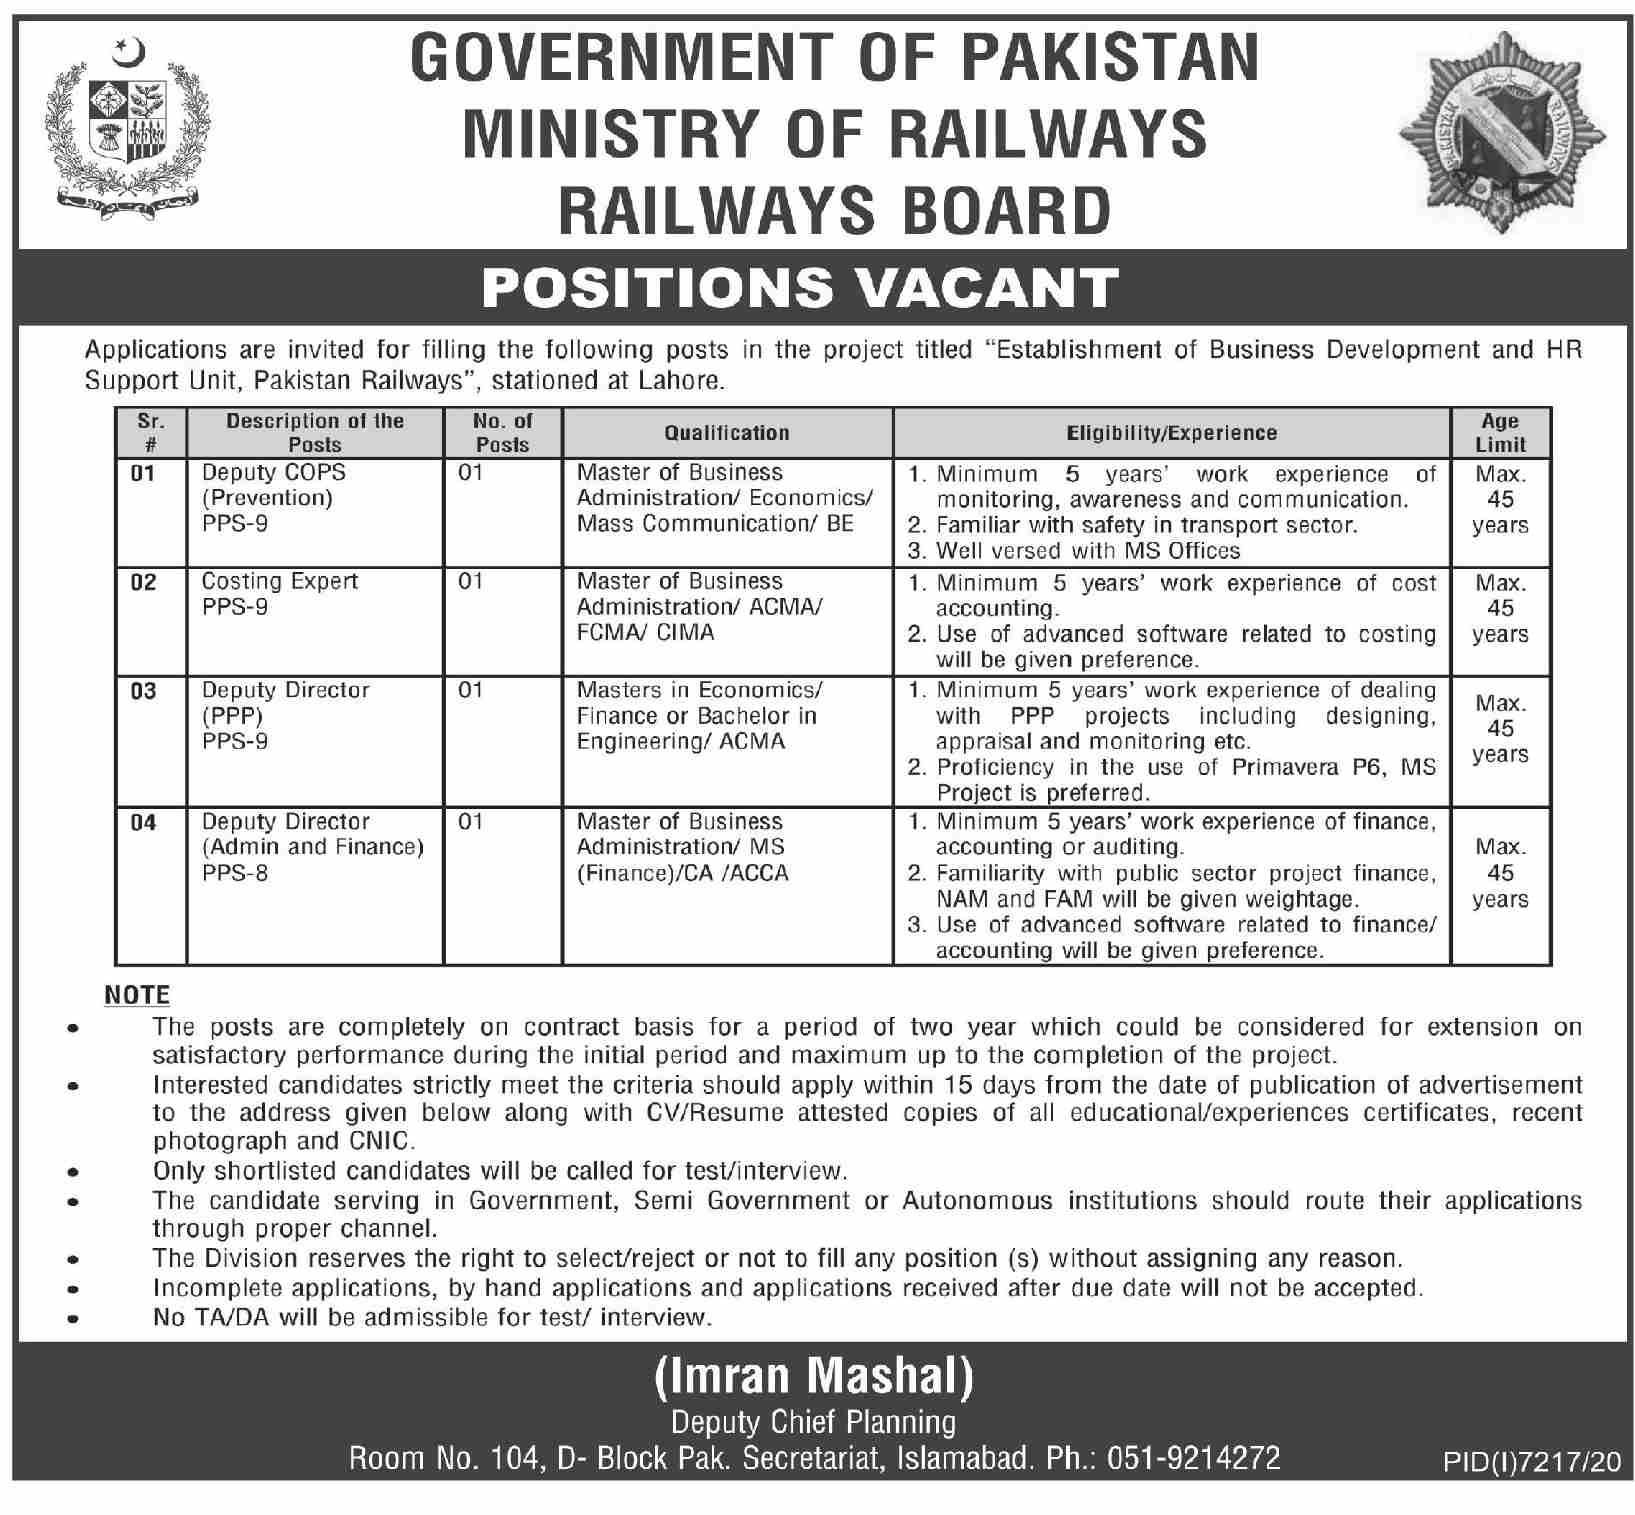 Ministry of Railways Jobs 2021 Govt of Pakistan Current Openings Advertisement